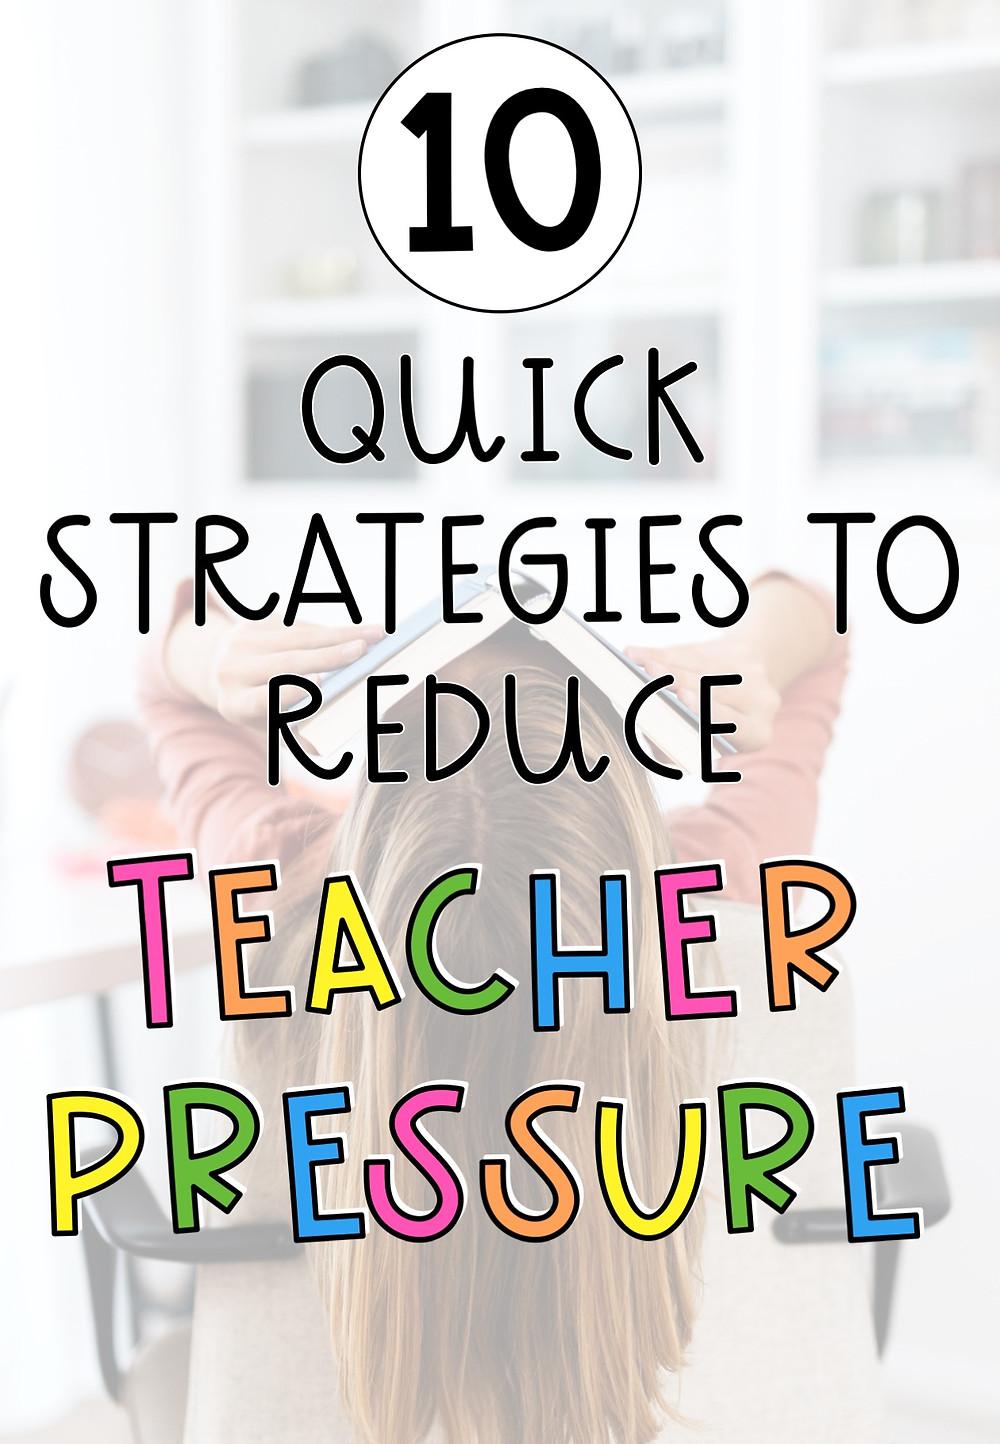 10 quick strategies to reduce teacher pressure